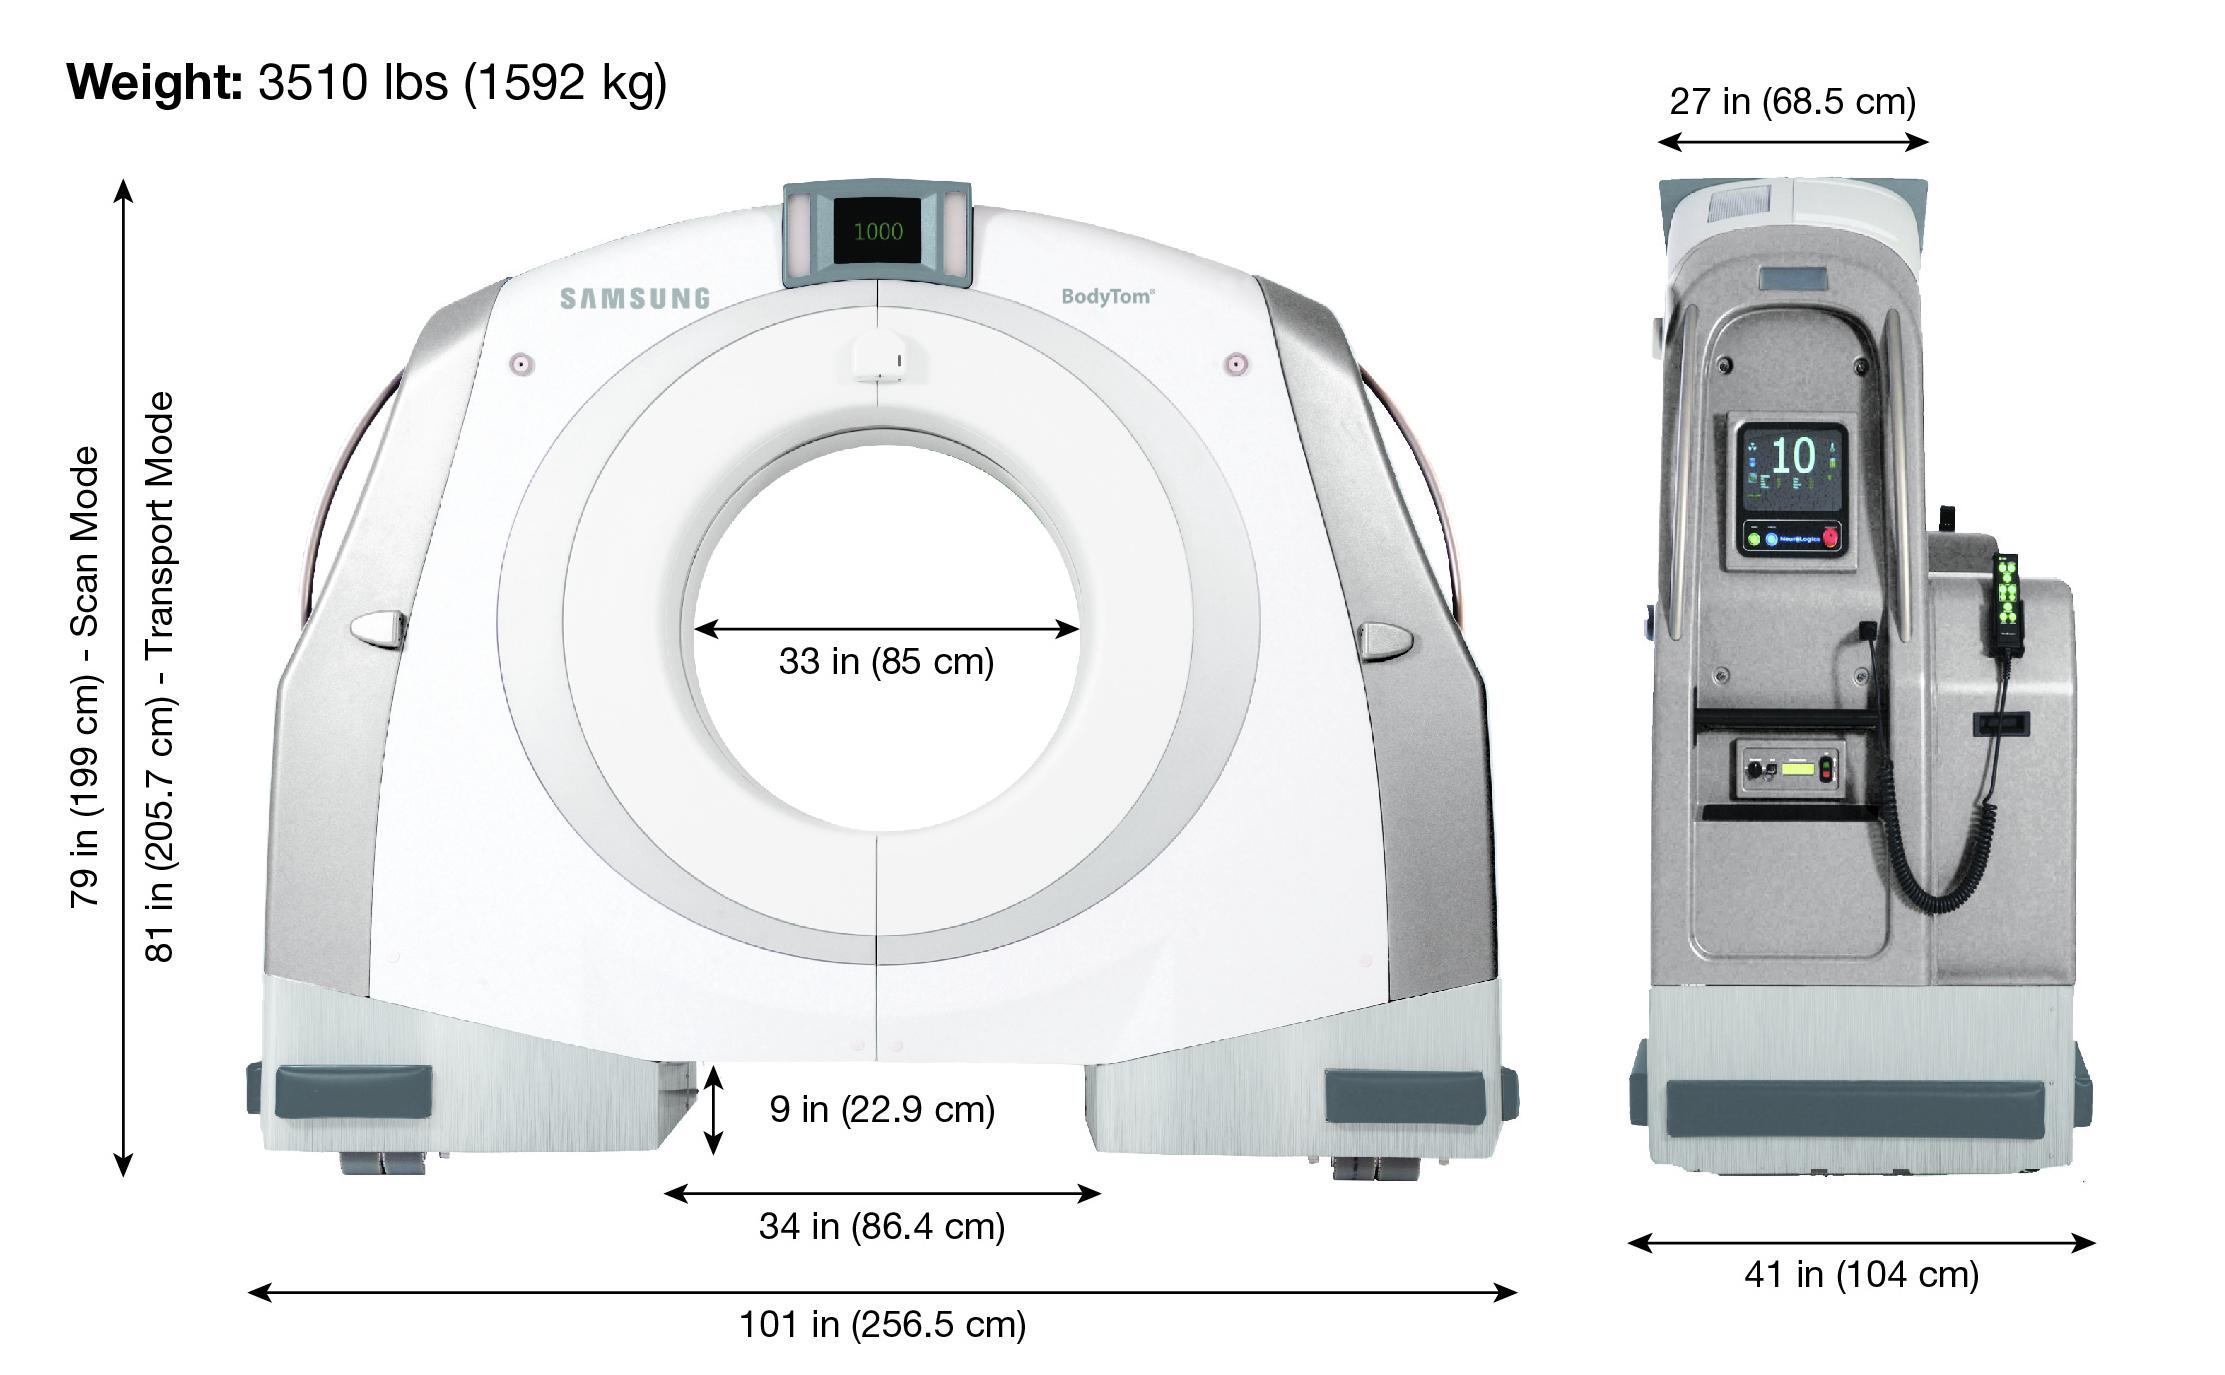 BodyTom Dimensions